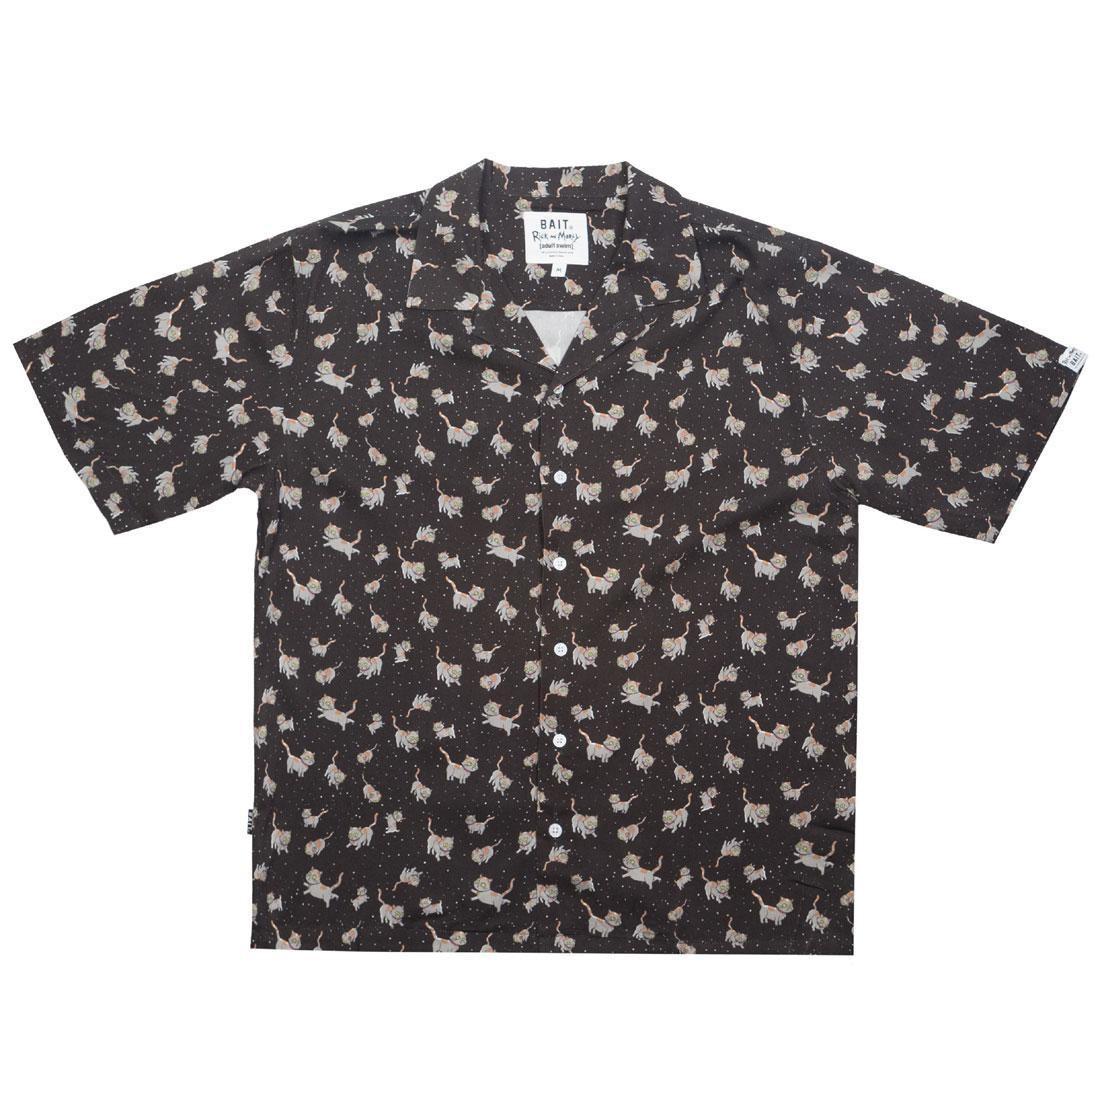 BAIT x Rick And Morty Men Cats Hawaiian Button Up (black)